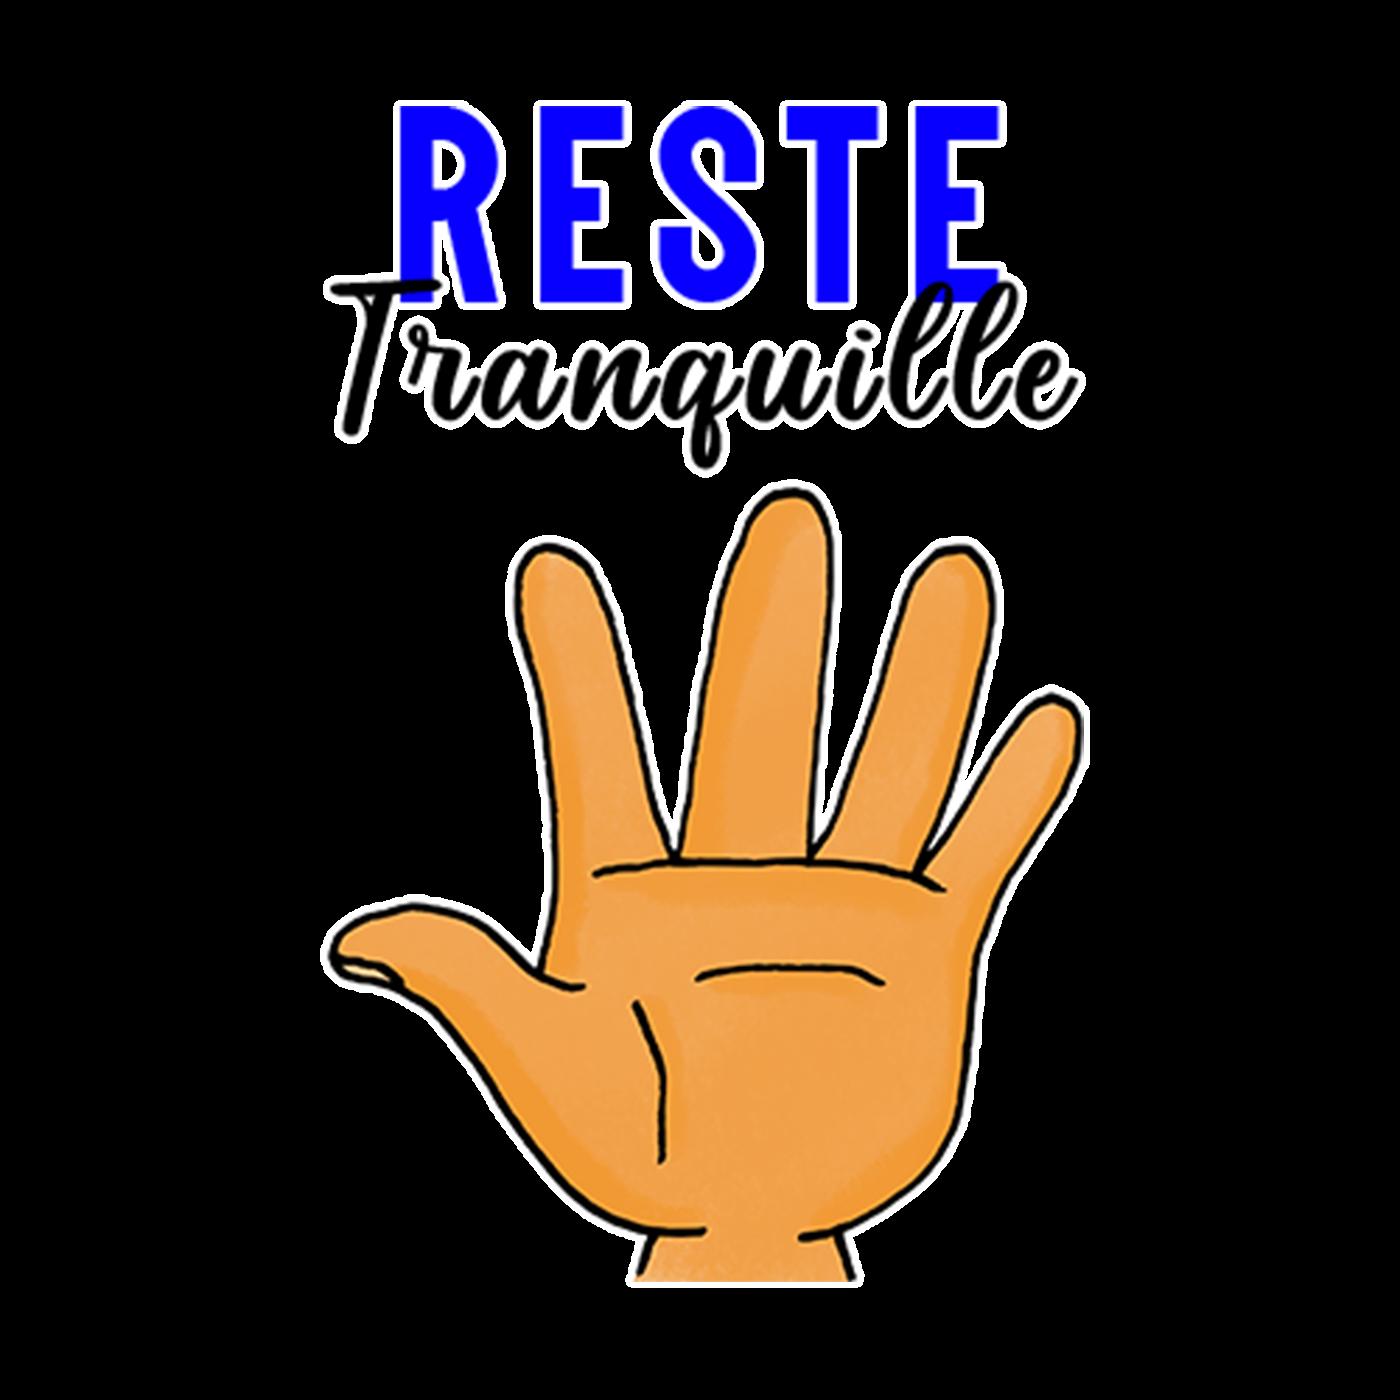 Reste Tranquille - Mer. 20 Jan. 2021 (Best-Of)